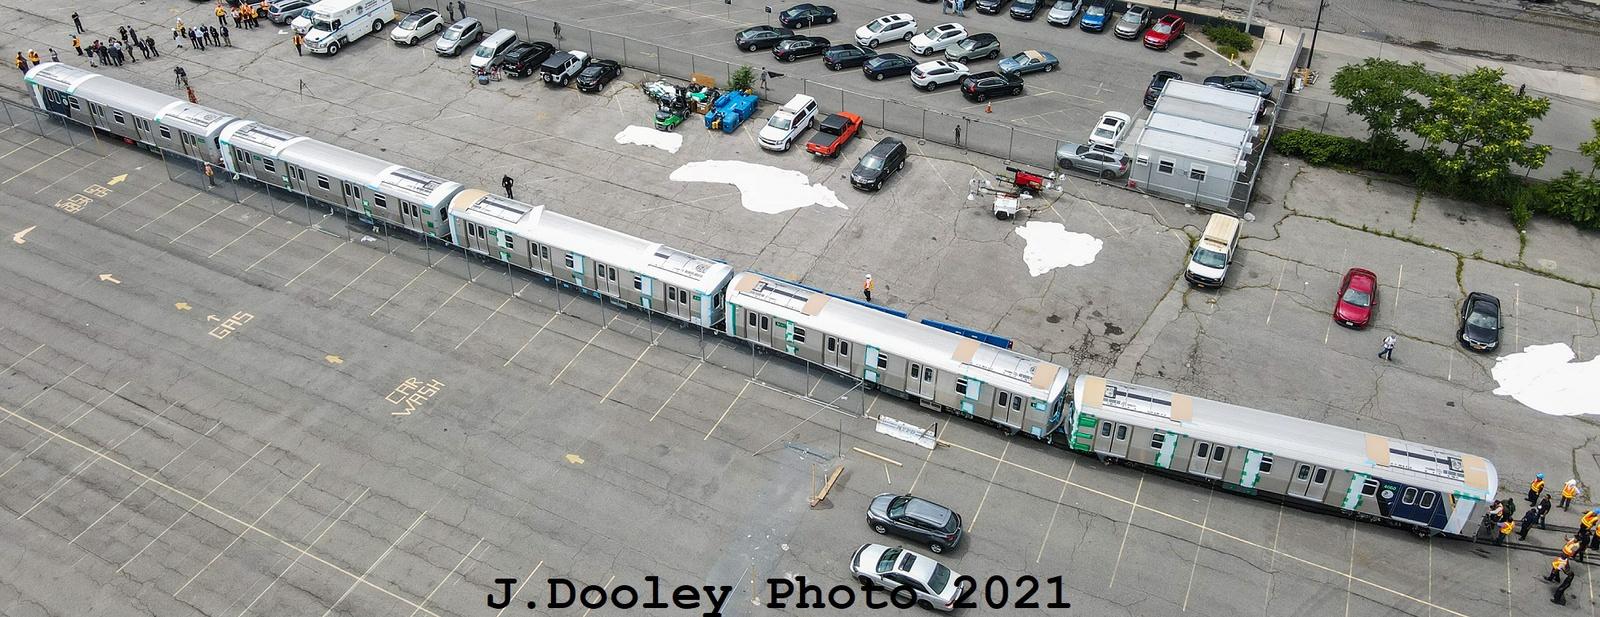 (519k, 1600x617)<br><b>Country:</b> United States<br><b>City:</b> New York<br><b>System:</b> New York City Transit<br><b>Car:</b> R-211 (Kawasaki, 2021-) 4060-4064 <br><b>Photo by:</b> John Dooley<br><b>Date:</b> 7/1/2021<br><b>Notes:</b> R-211 delivery and press conference.<br><b>Viewed (this week/total):</b> 0 / 328